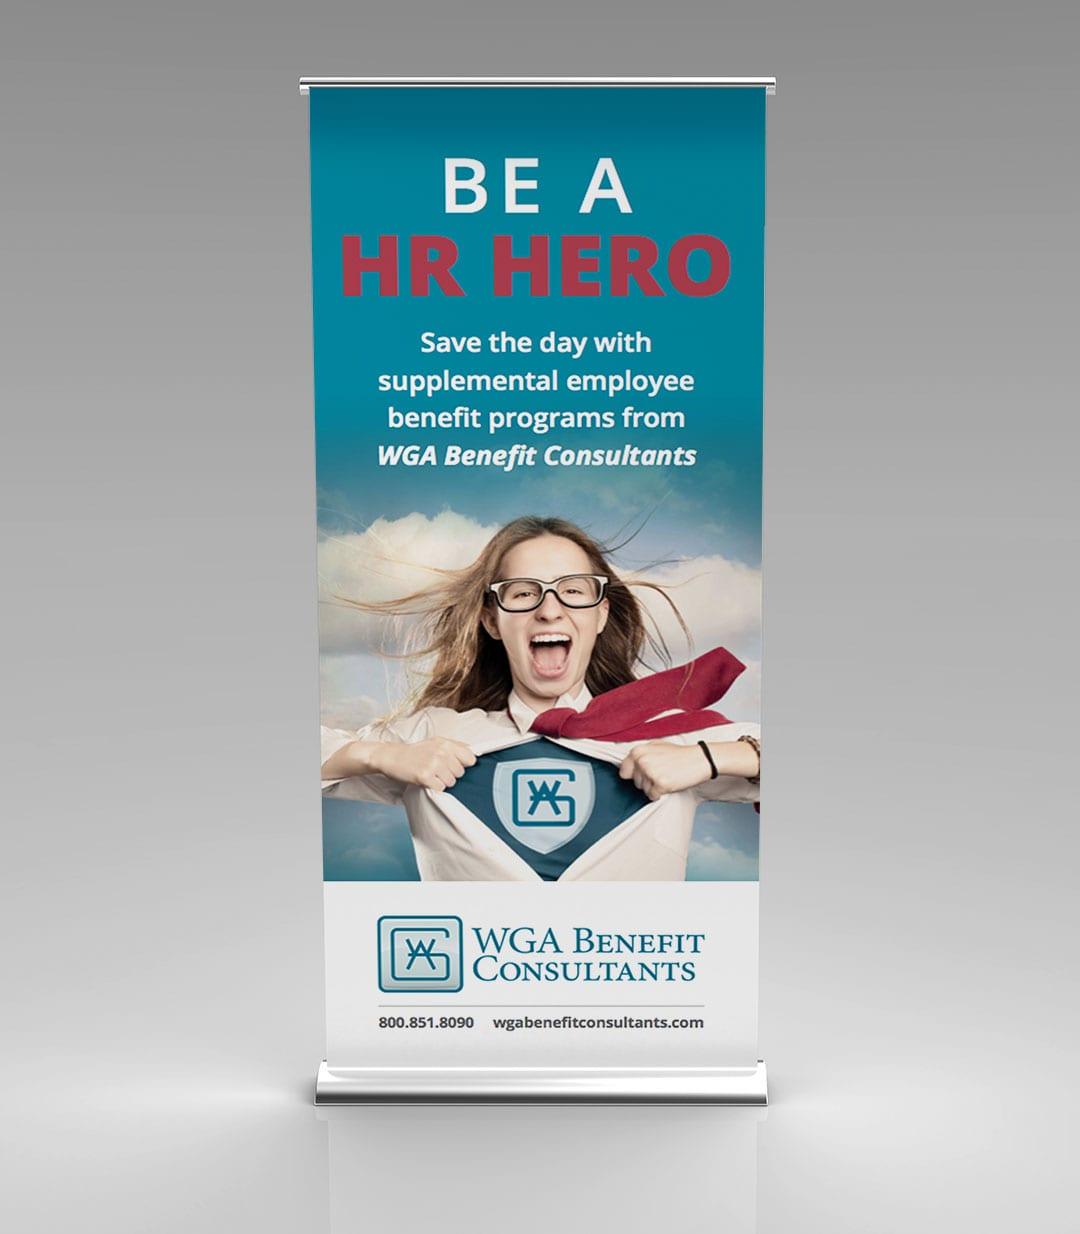 WGA Benefit Consultants Banner Design by Liquid Media